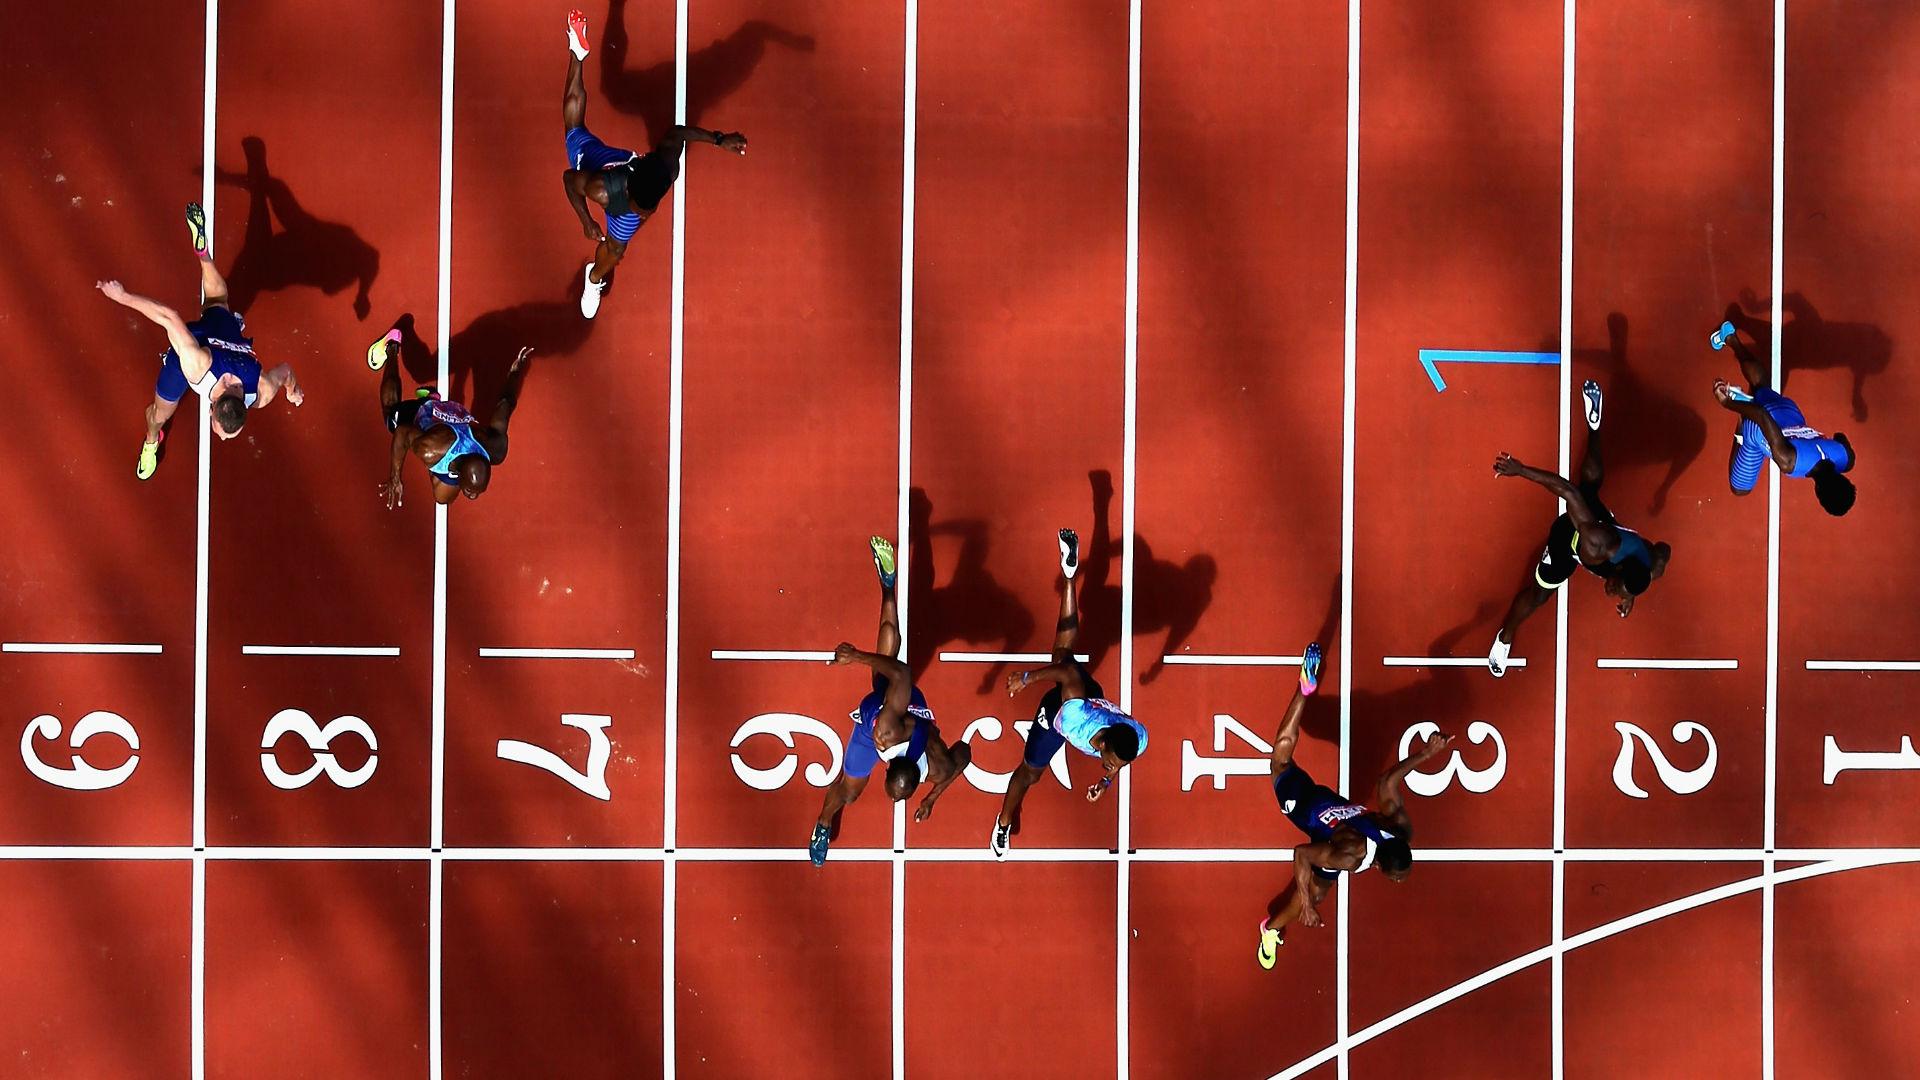 The Atheltics World Cup comes to London Stadium, 14-15 Jul. Image courtesy of Getty Images / British Athletics